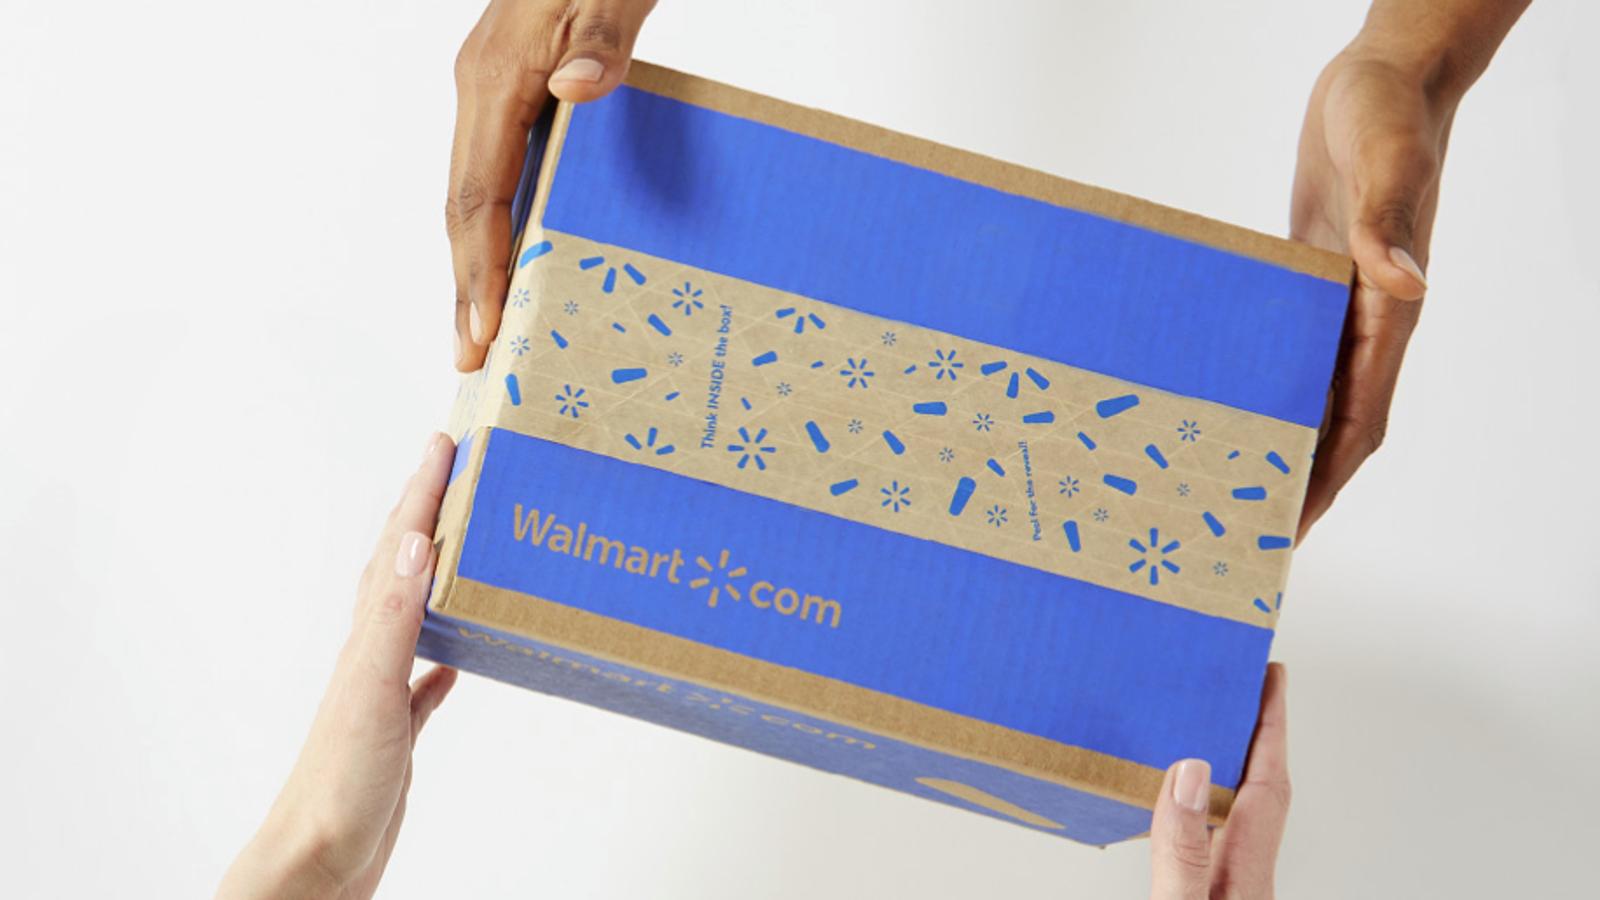 Walmart and Microsoft Team Up to Take Down Amazon